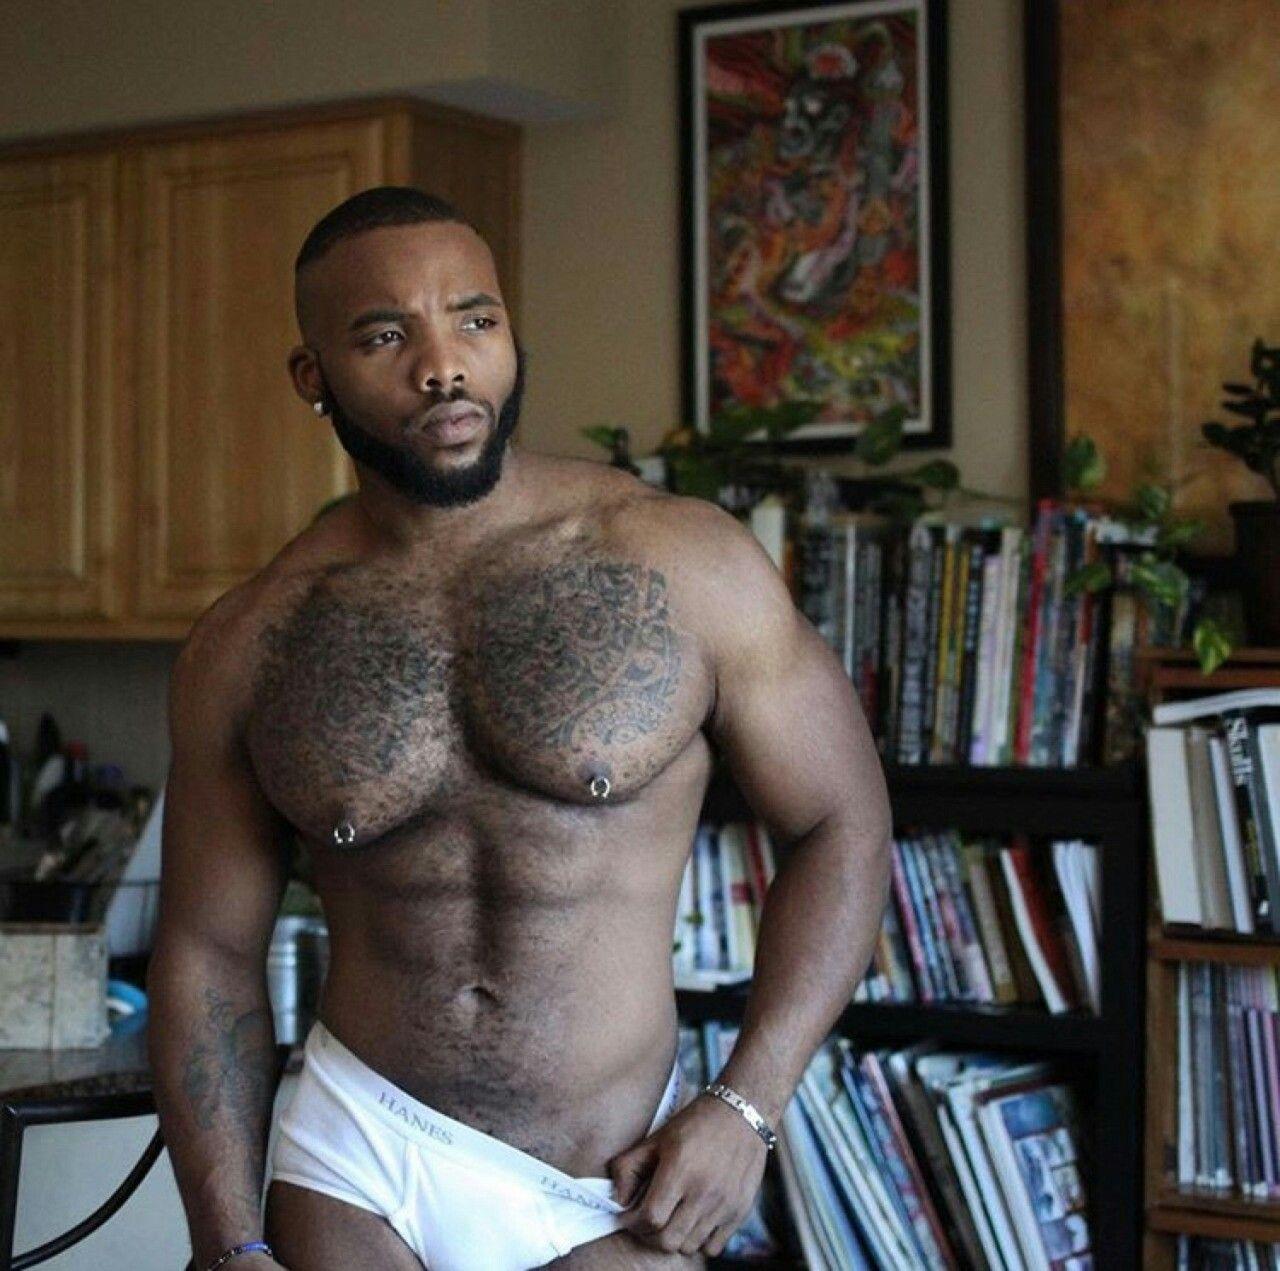 Hairy thai nude men galleries 101